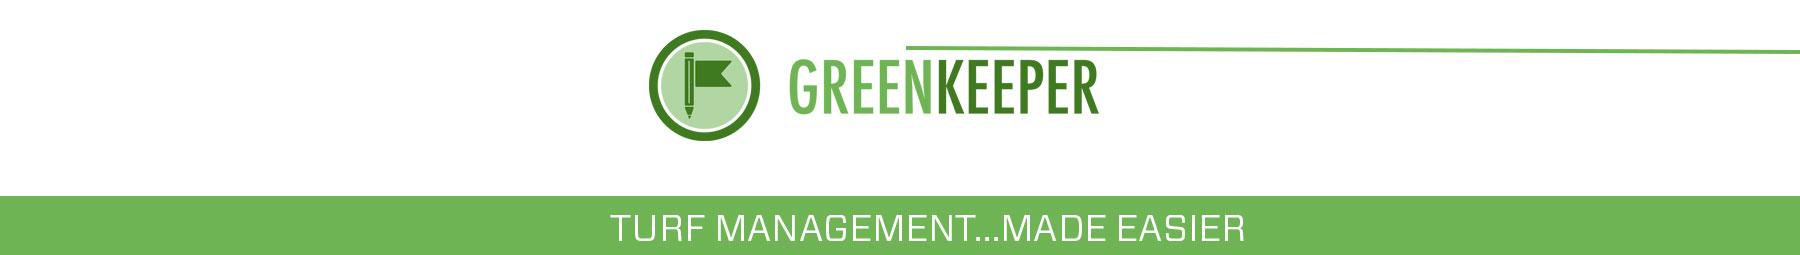 Green Keeper Carousel Image